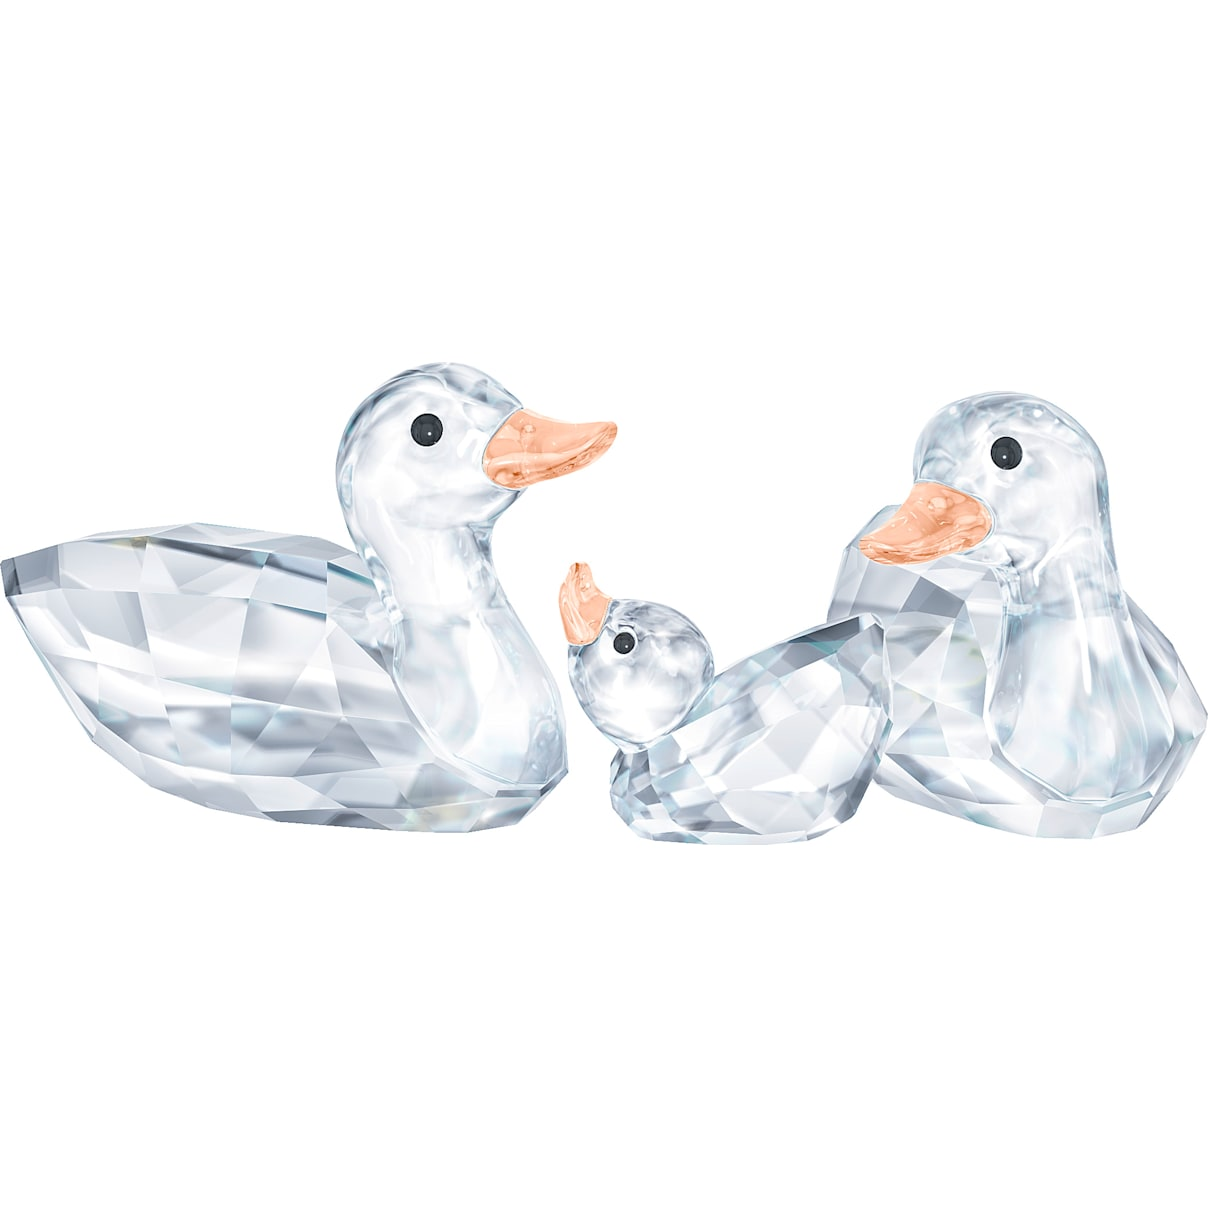 Swarovski Ducks